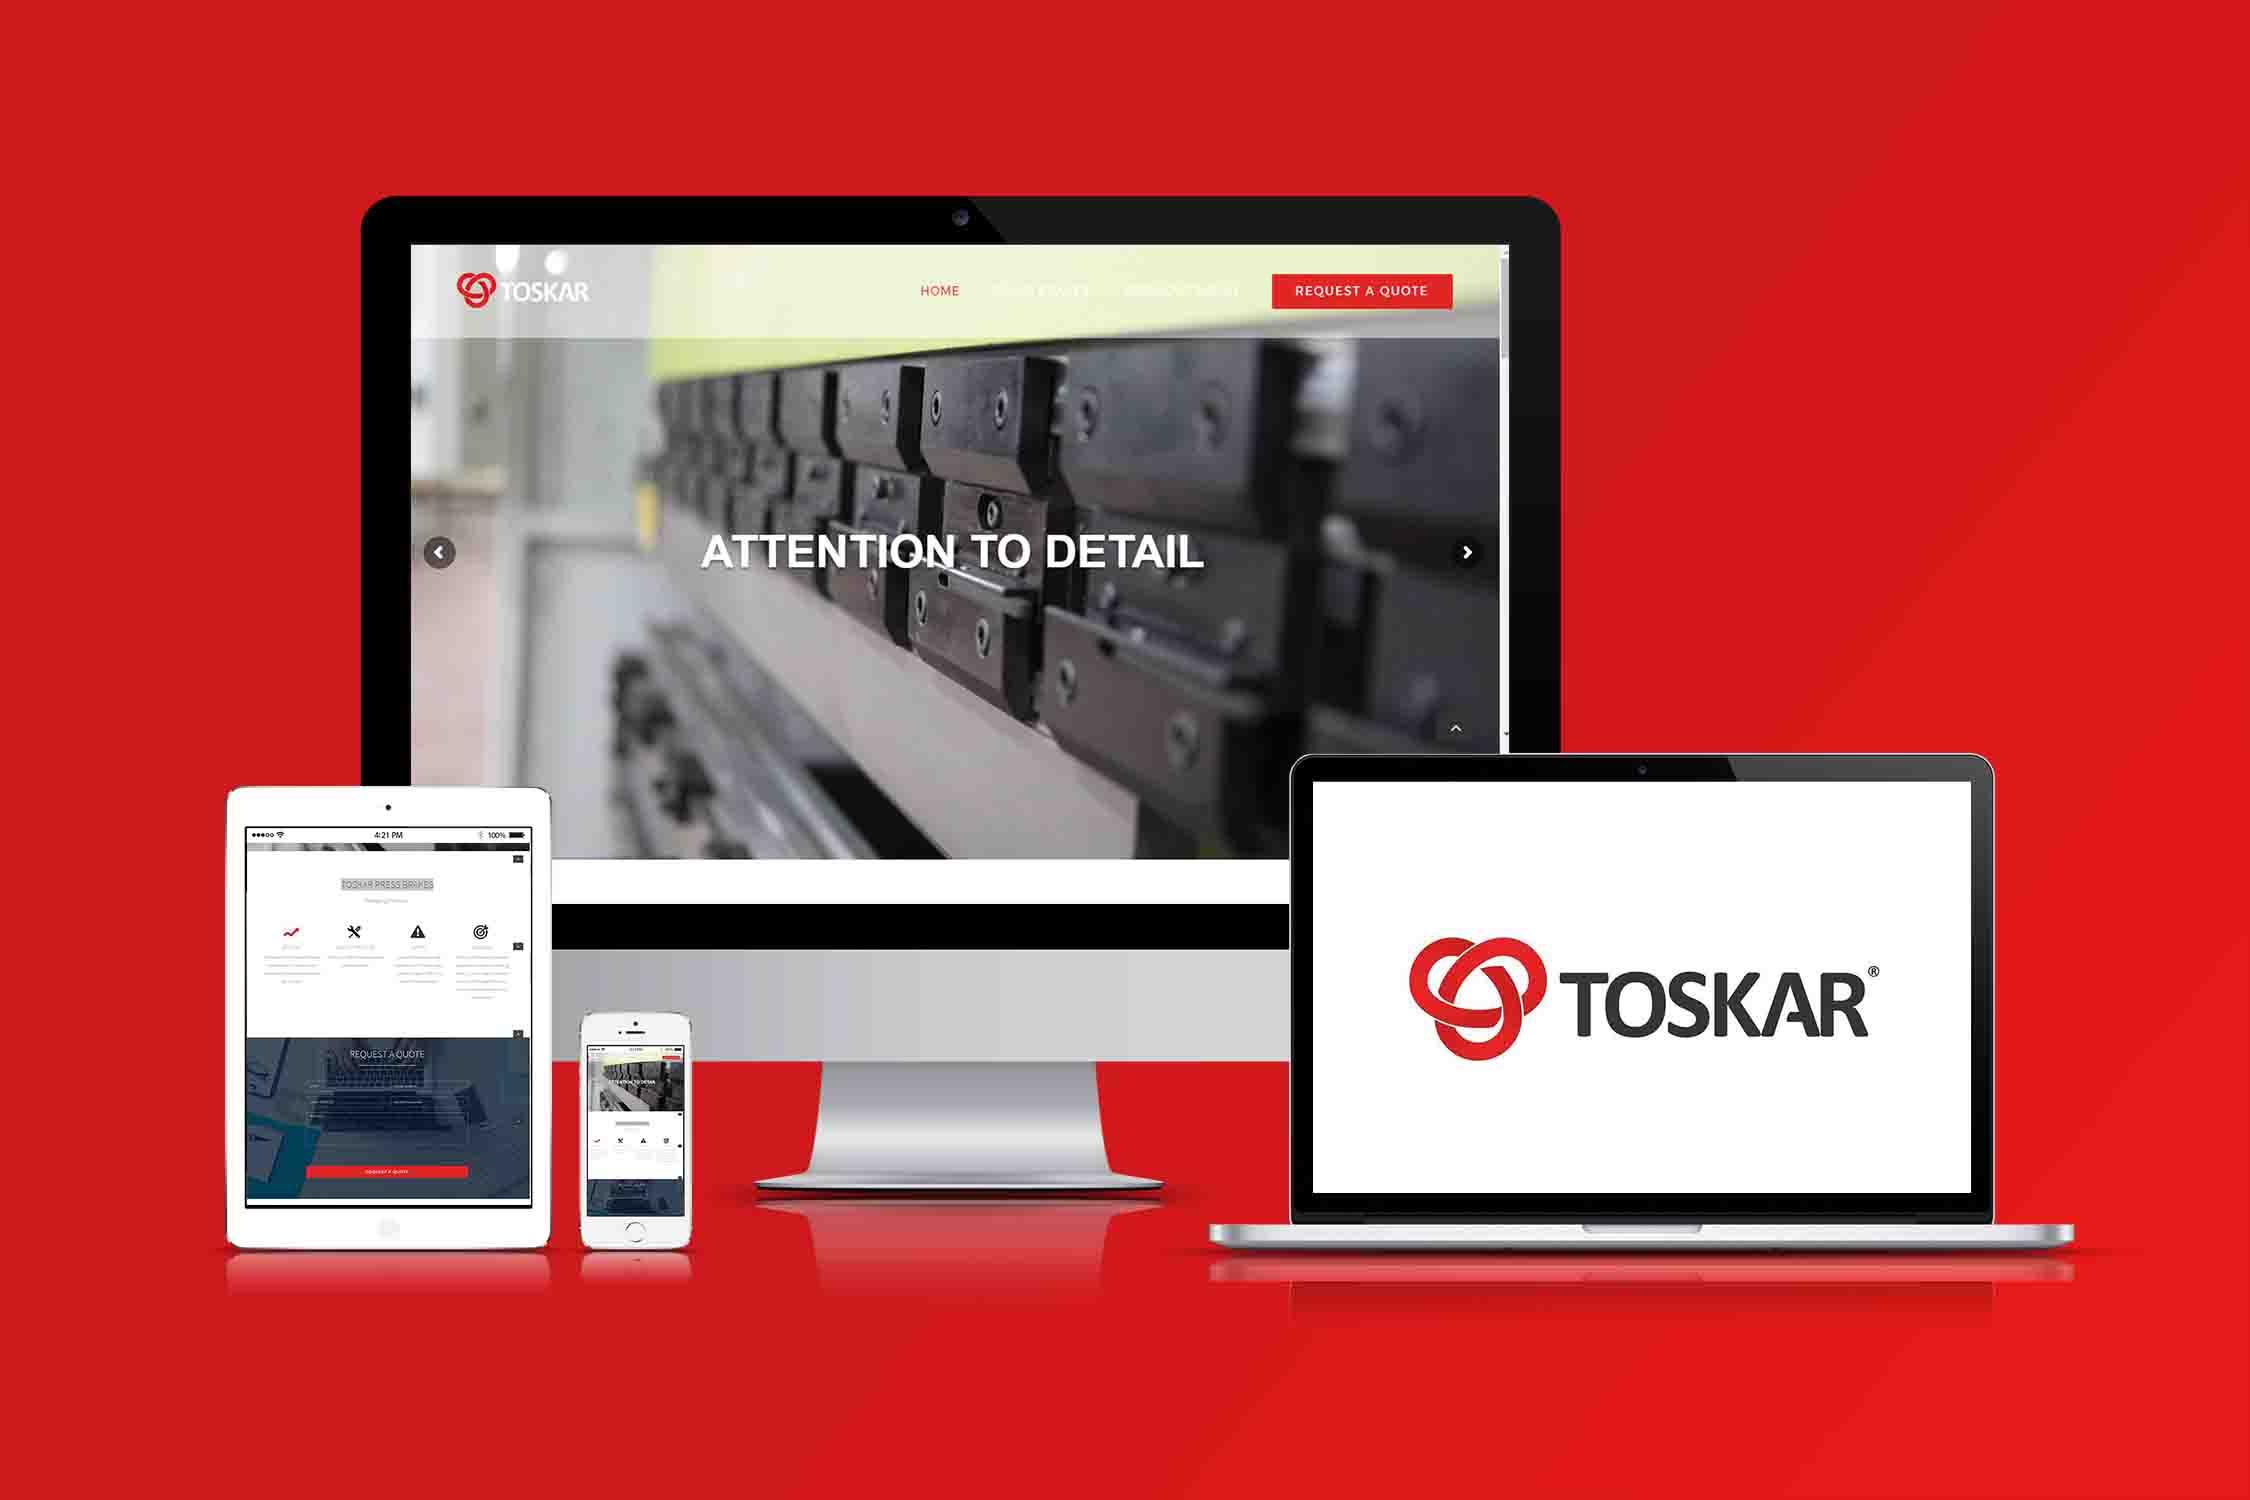 TOSKAR PRESS BRAKES